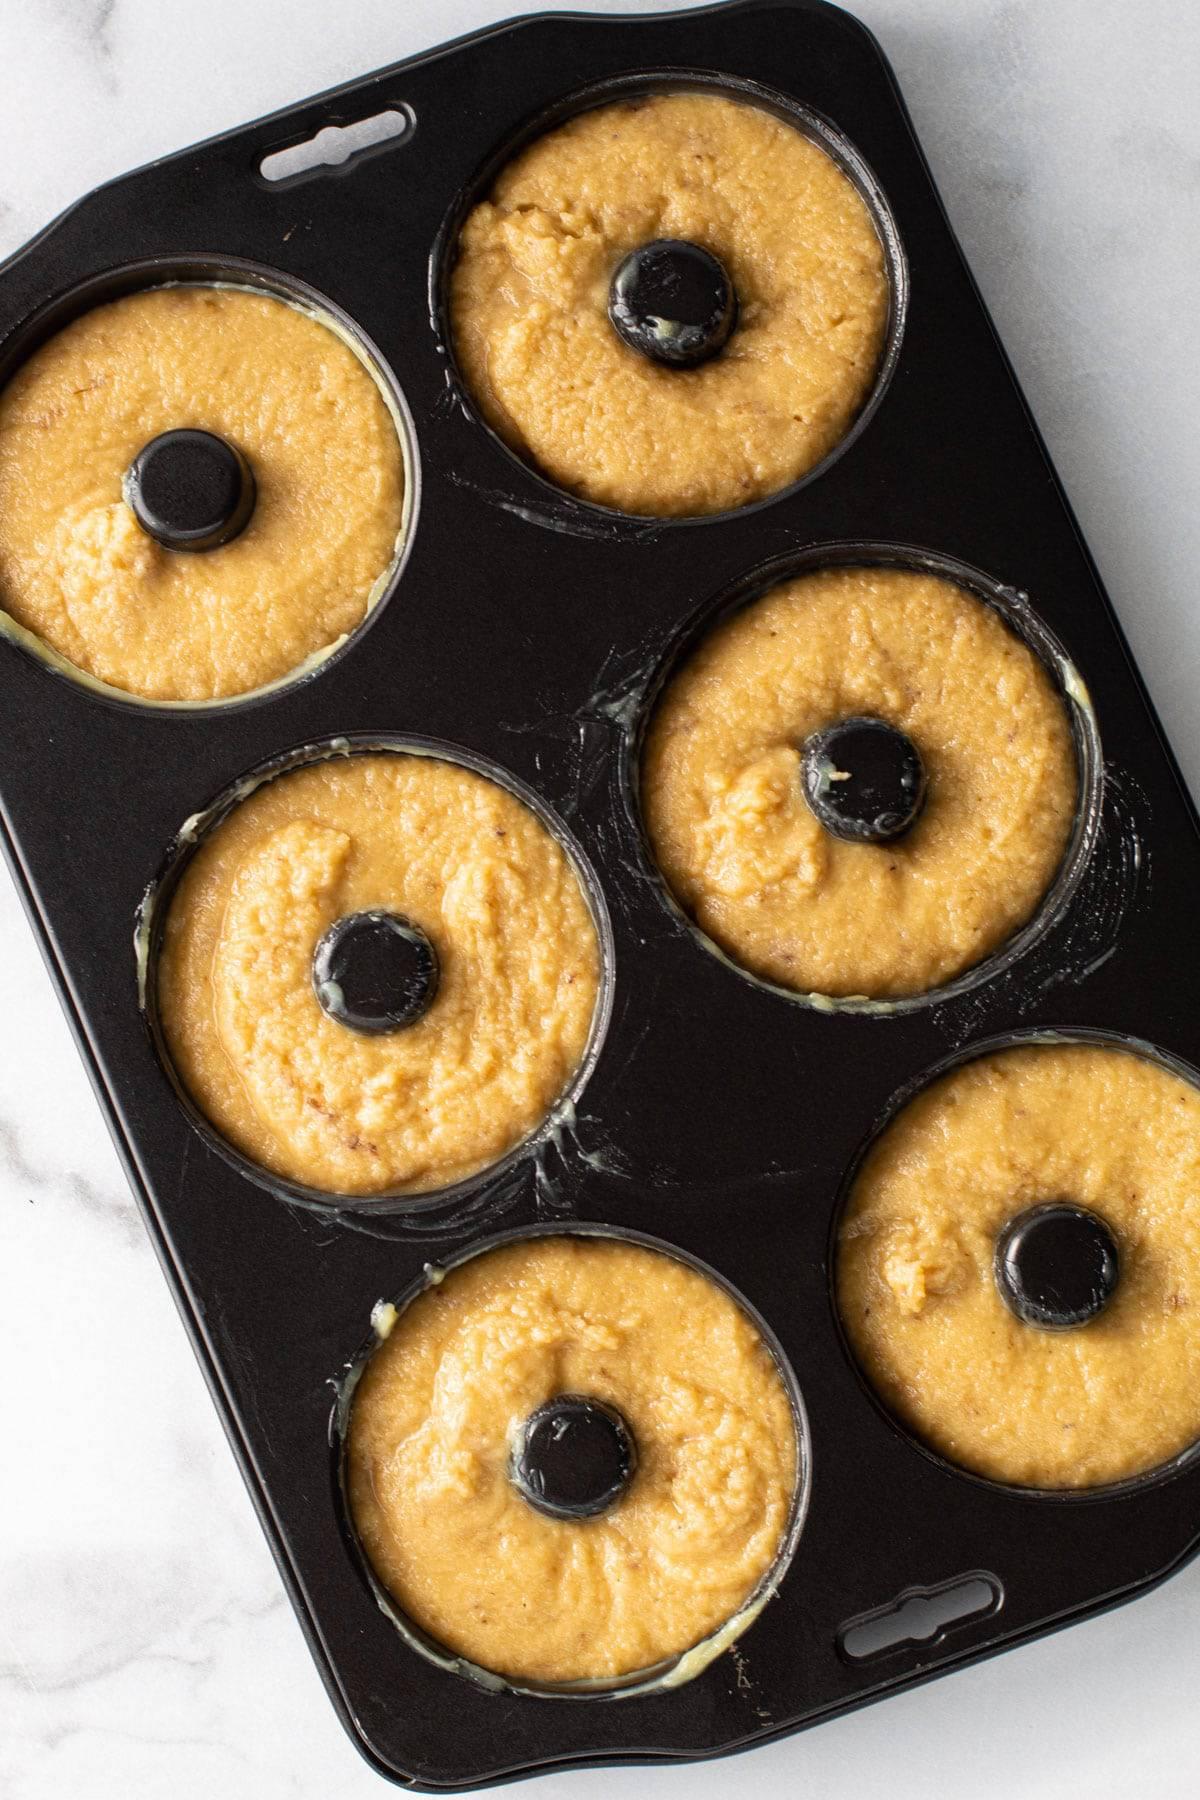 Gluten Free Banana Doughnuts in a baking tray.